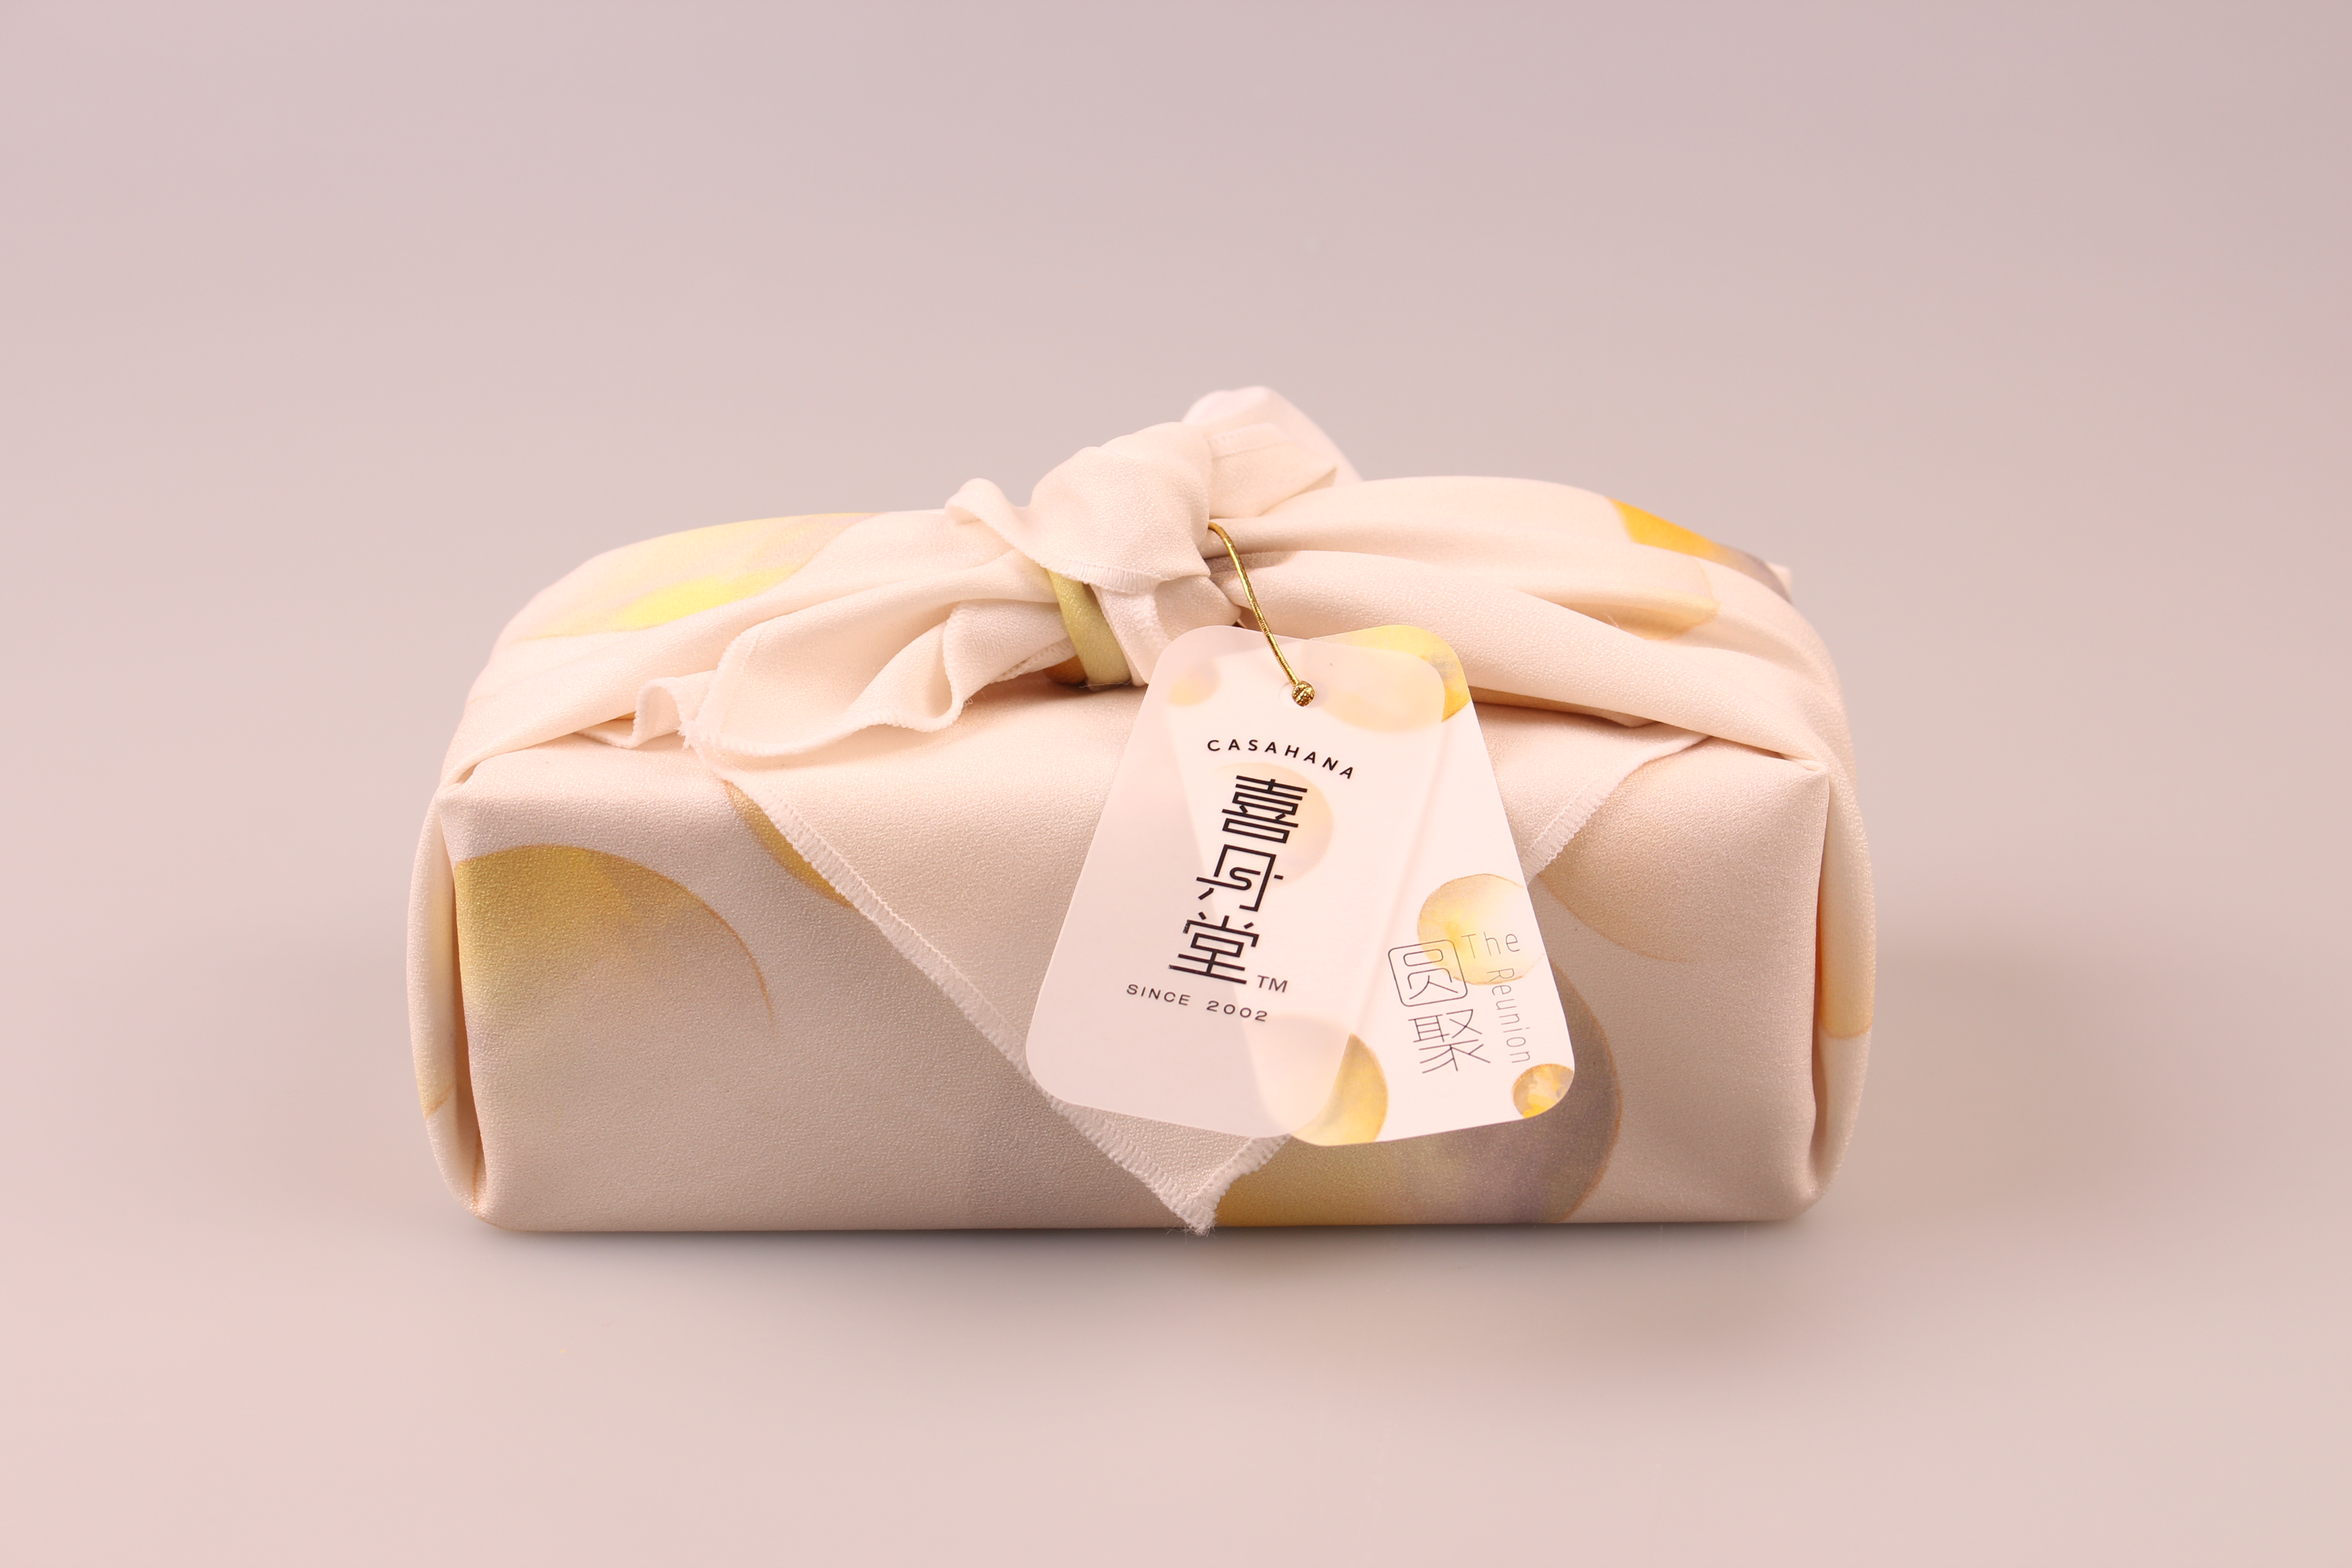 Casahana Mooncake Packaging